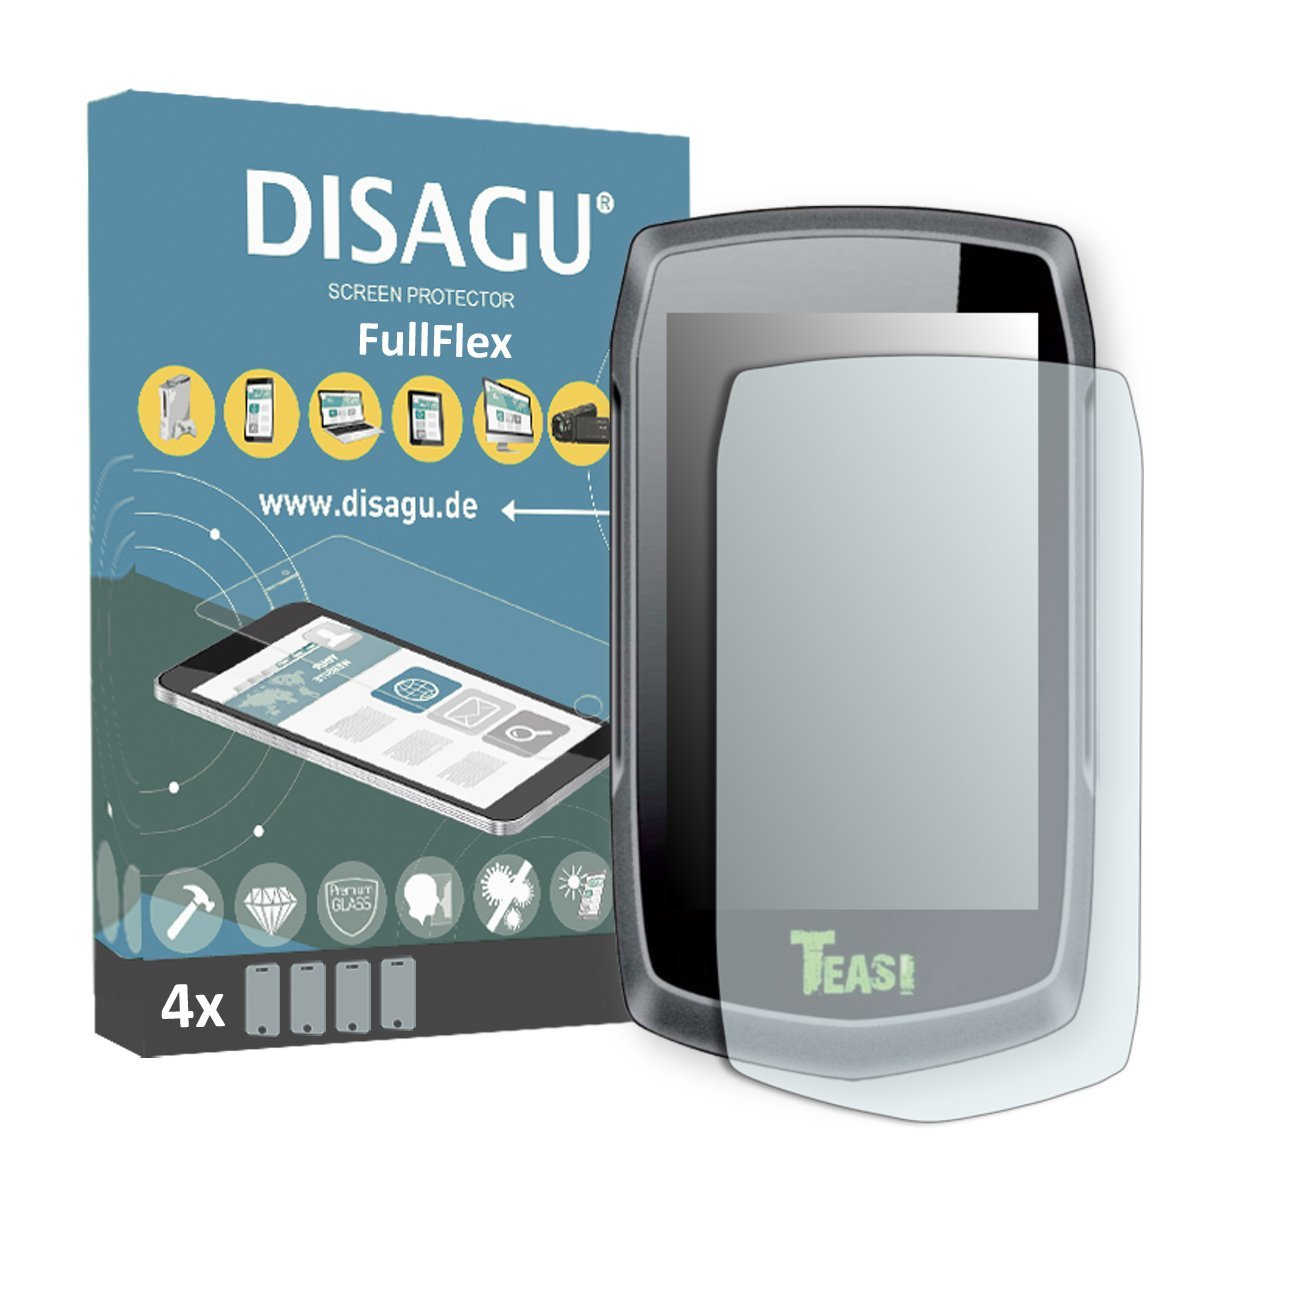 4 x Disagu FullFlex screen protector for Teasi One2 foil screen protector